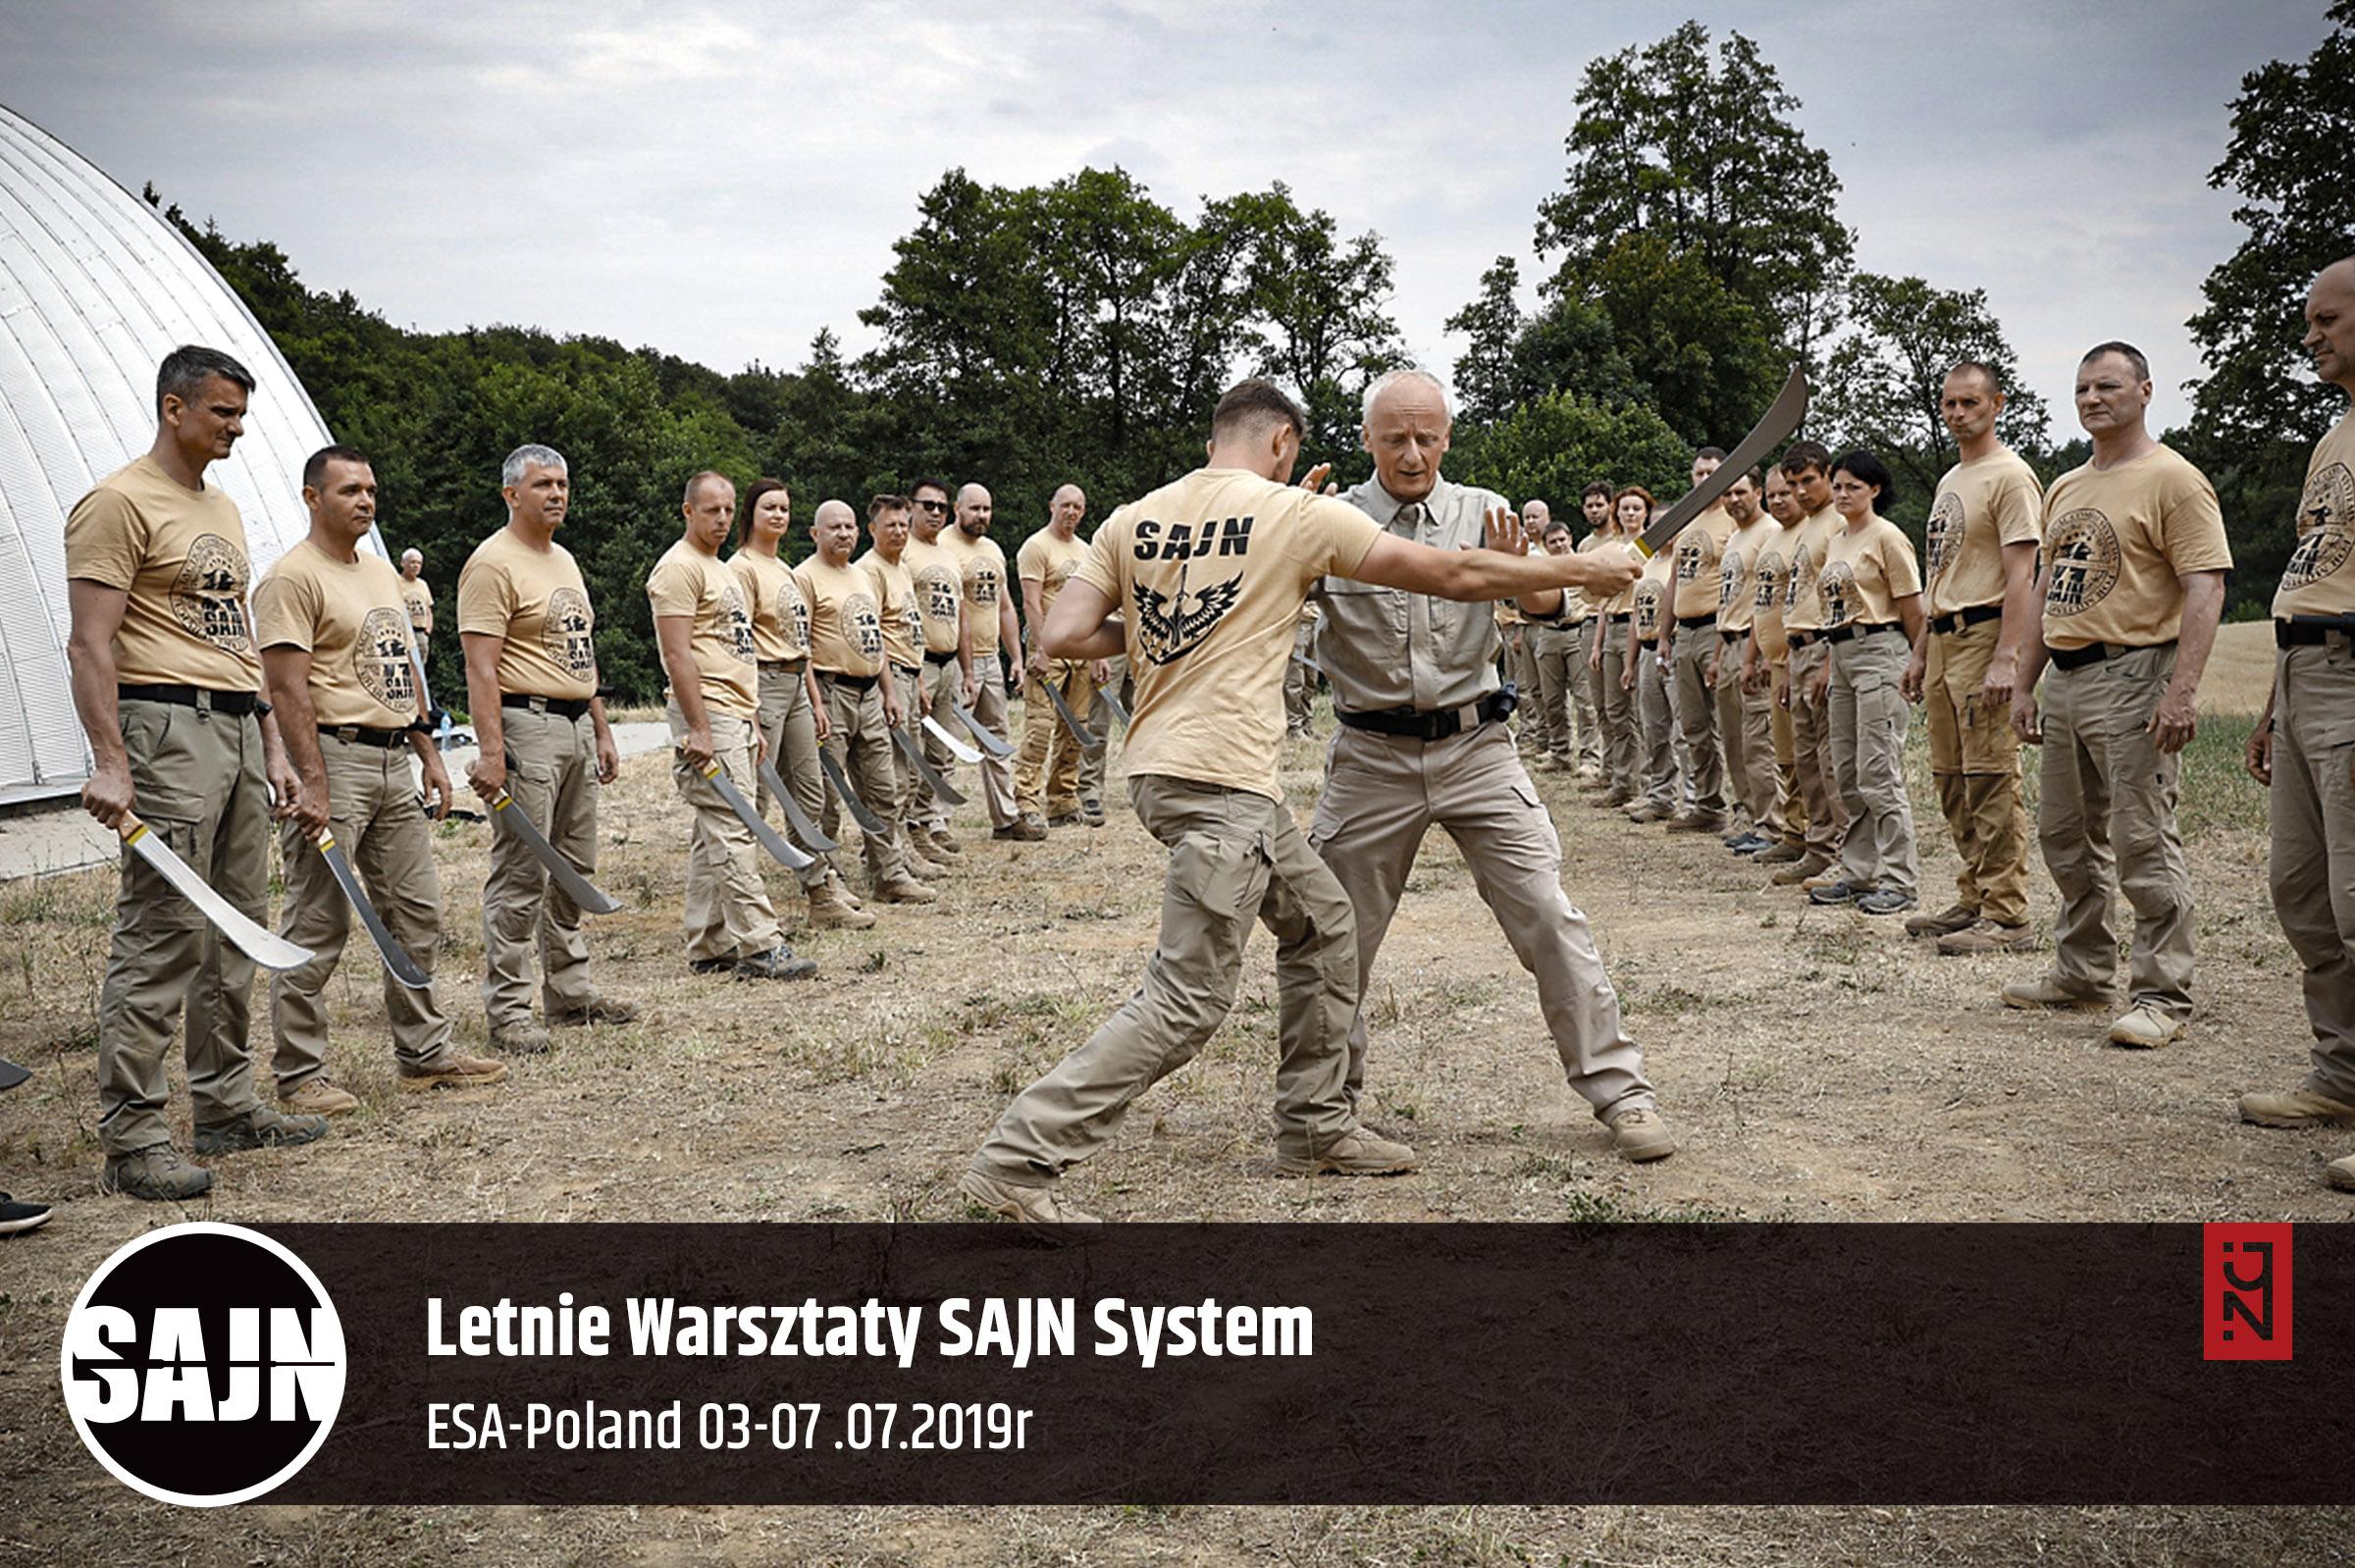 jan nycek_sajn_szkolenie sluzb mundurowych_palka teleskopowa_noz_samoobrona_dosan_16.jpg